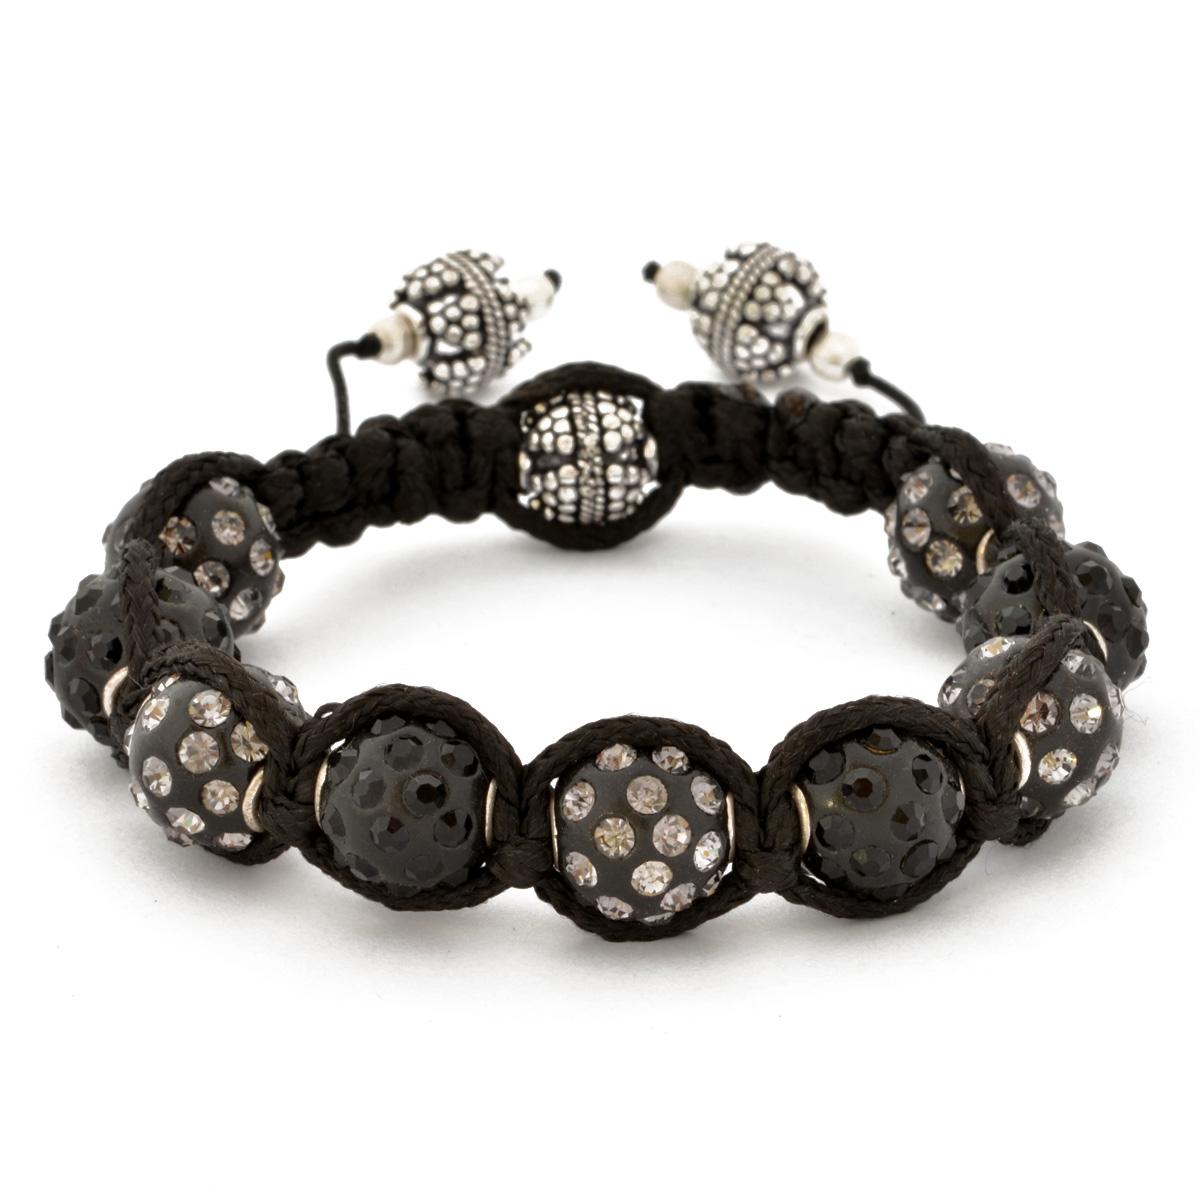 Shamballa Bracelet With Black Beads In Gray Rhinestones